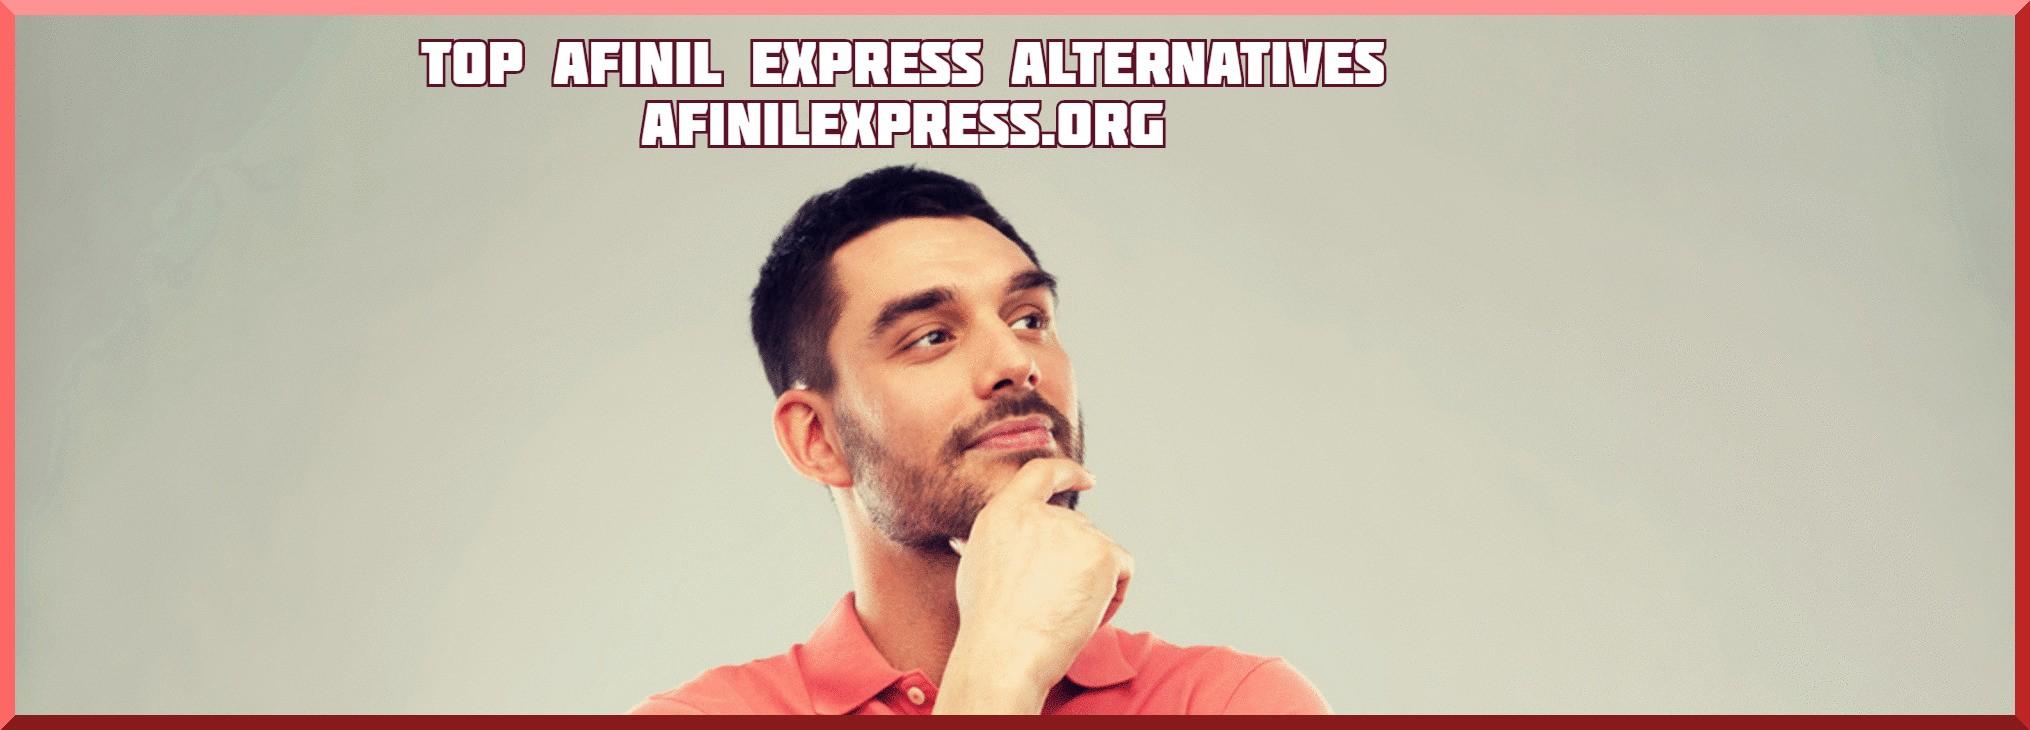 Top Afinil Express Alternatives